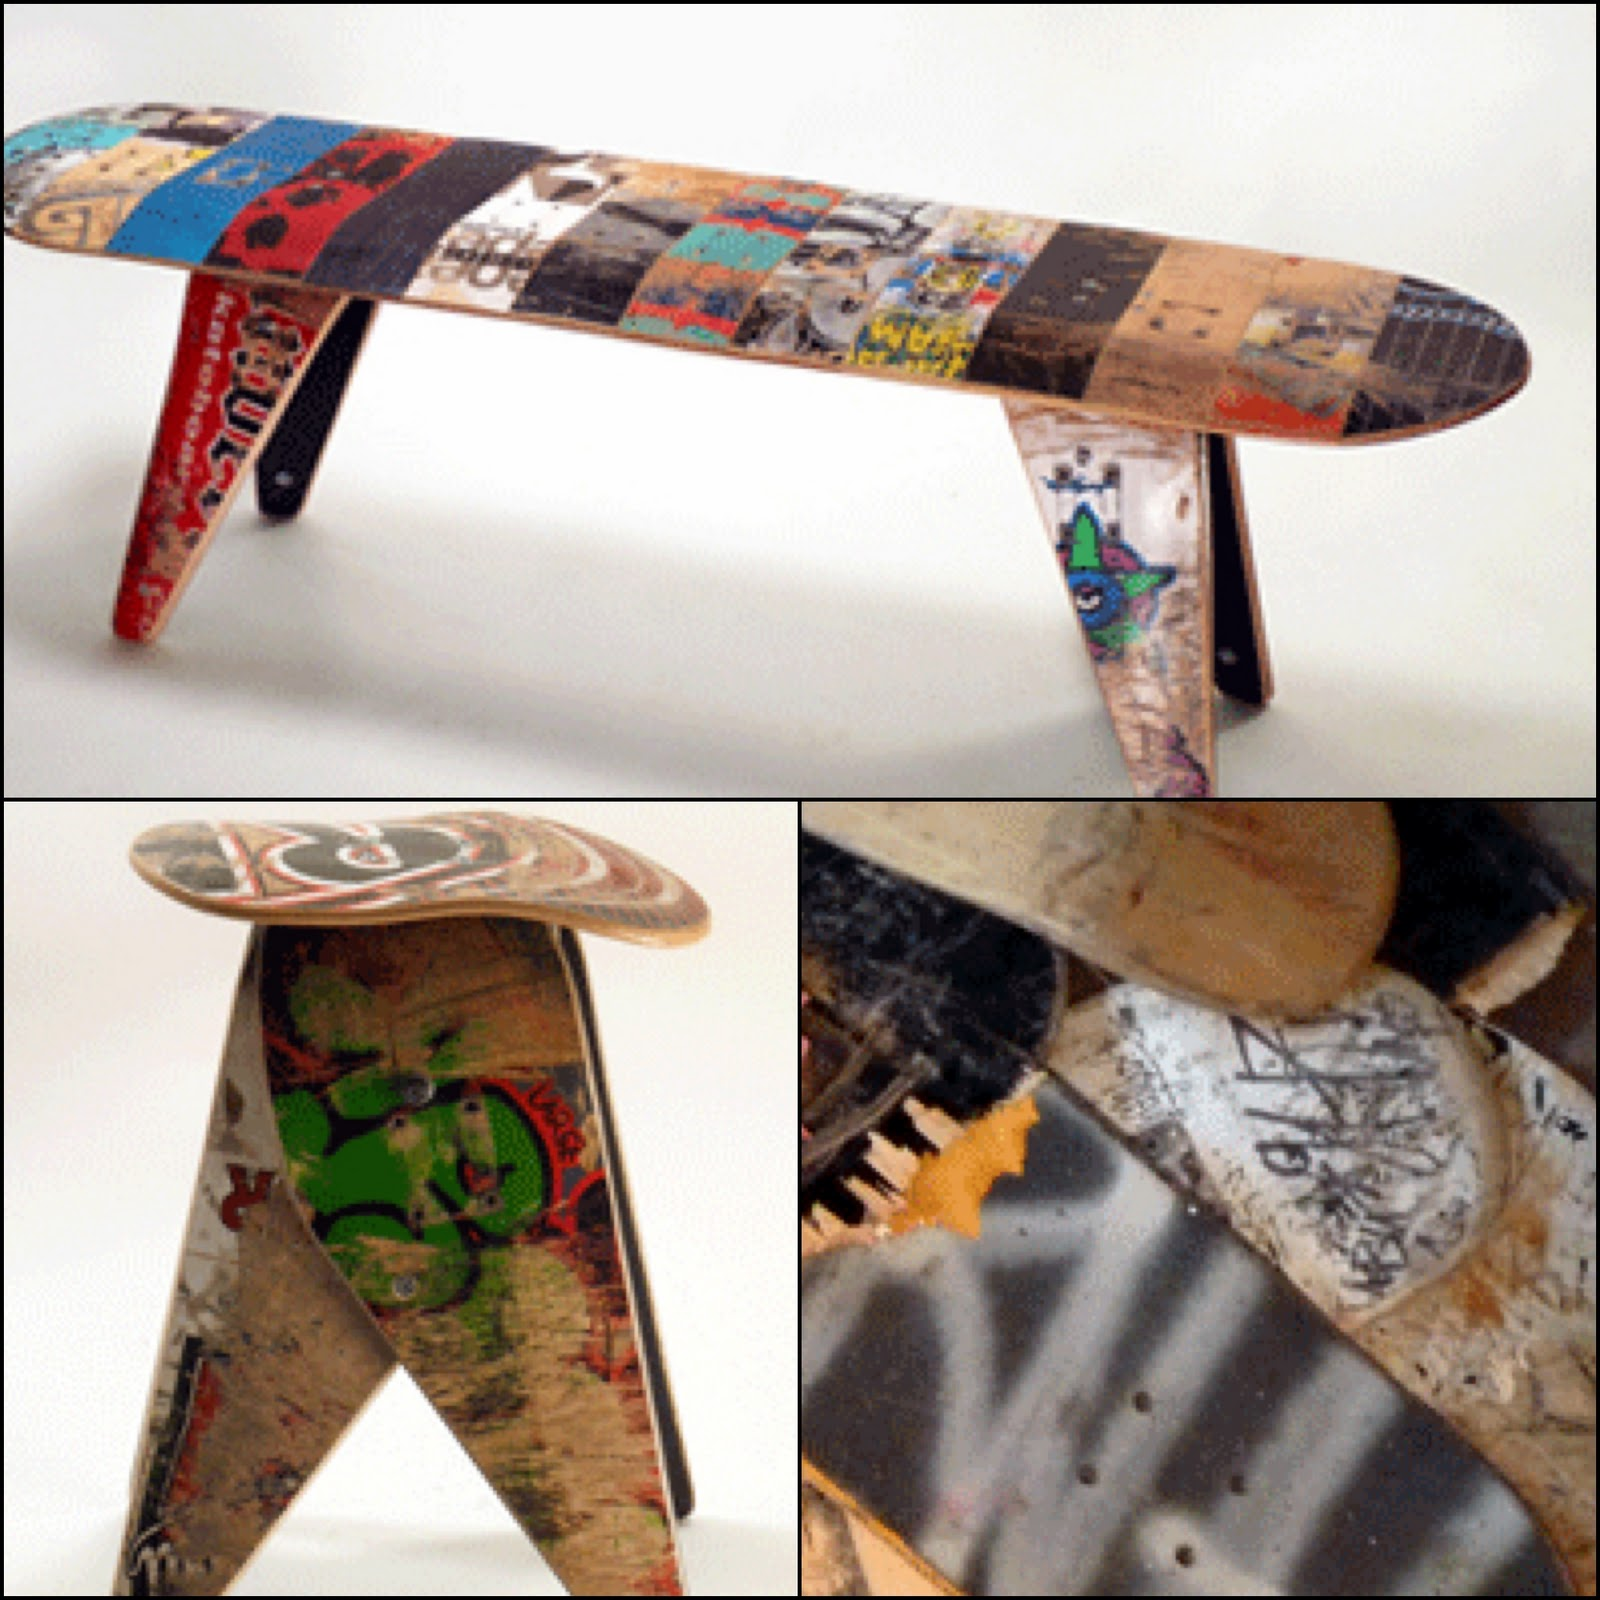 Deckstool Recycled Skateboards Furniture